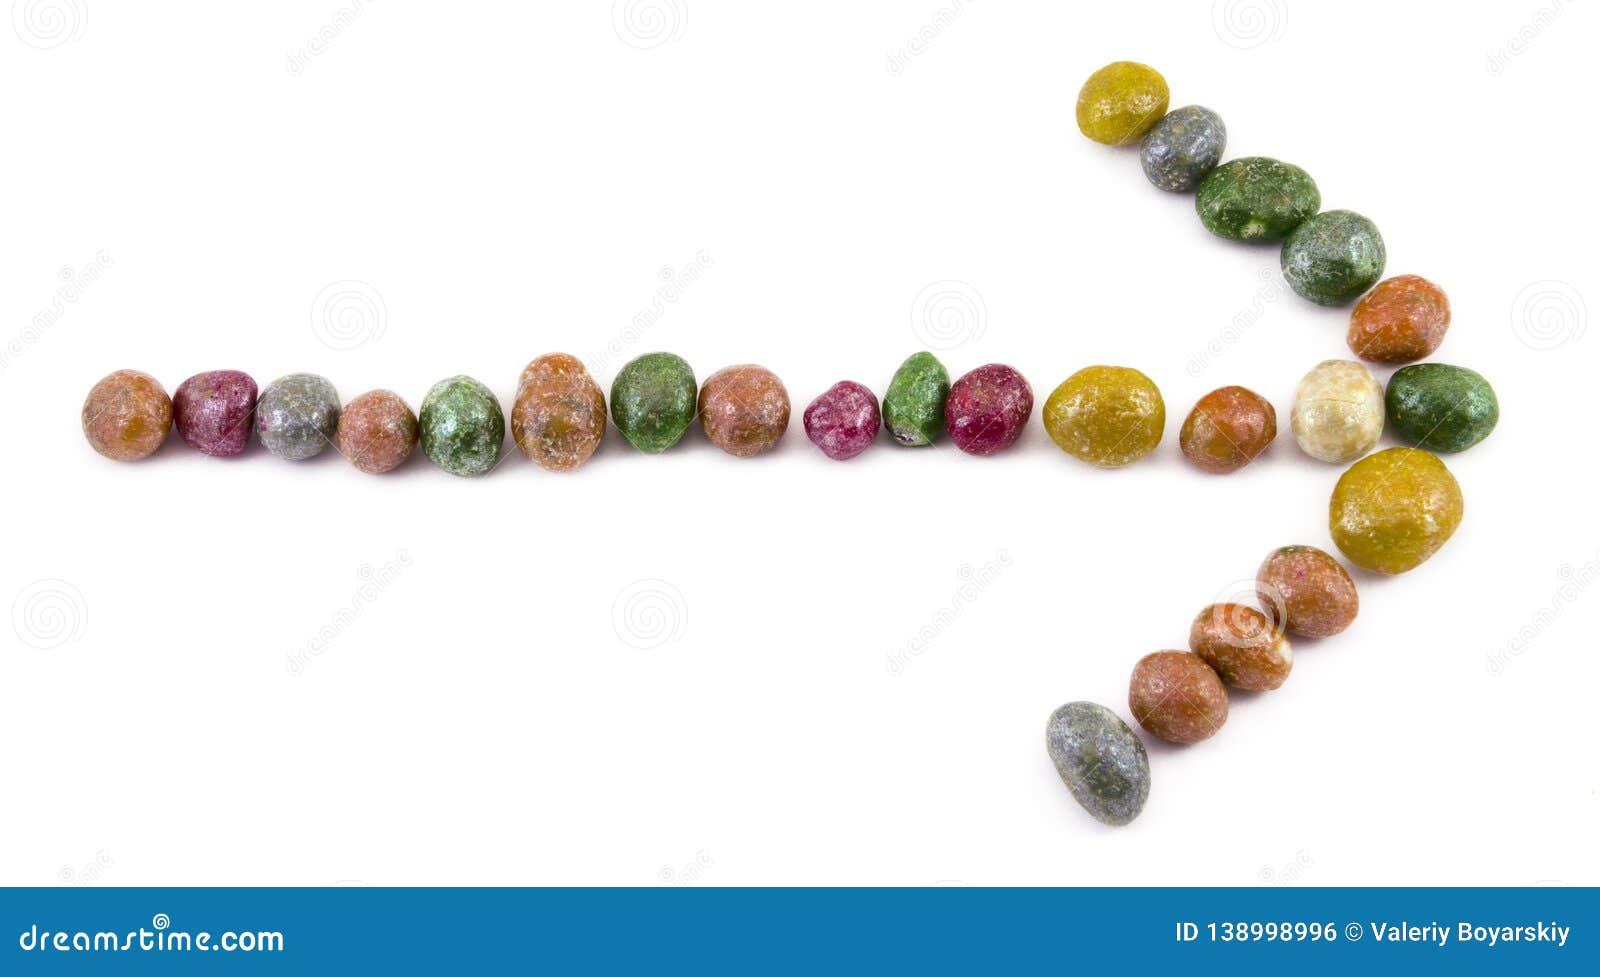 Multicolored glazed raisins on a white background